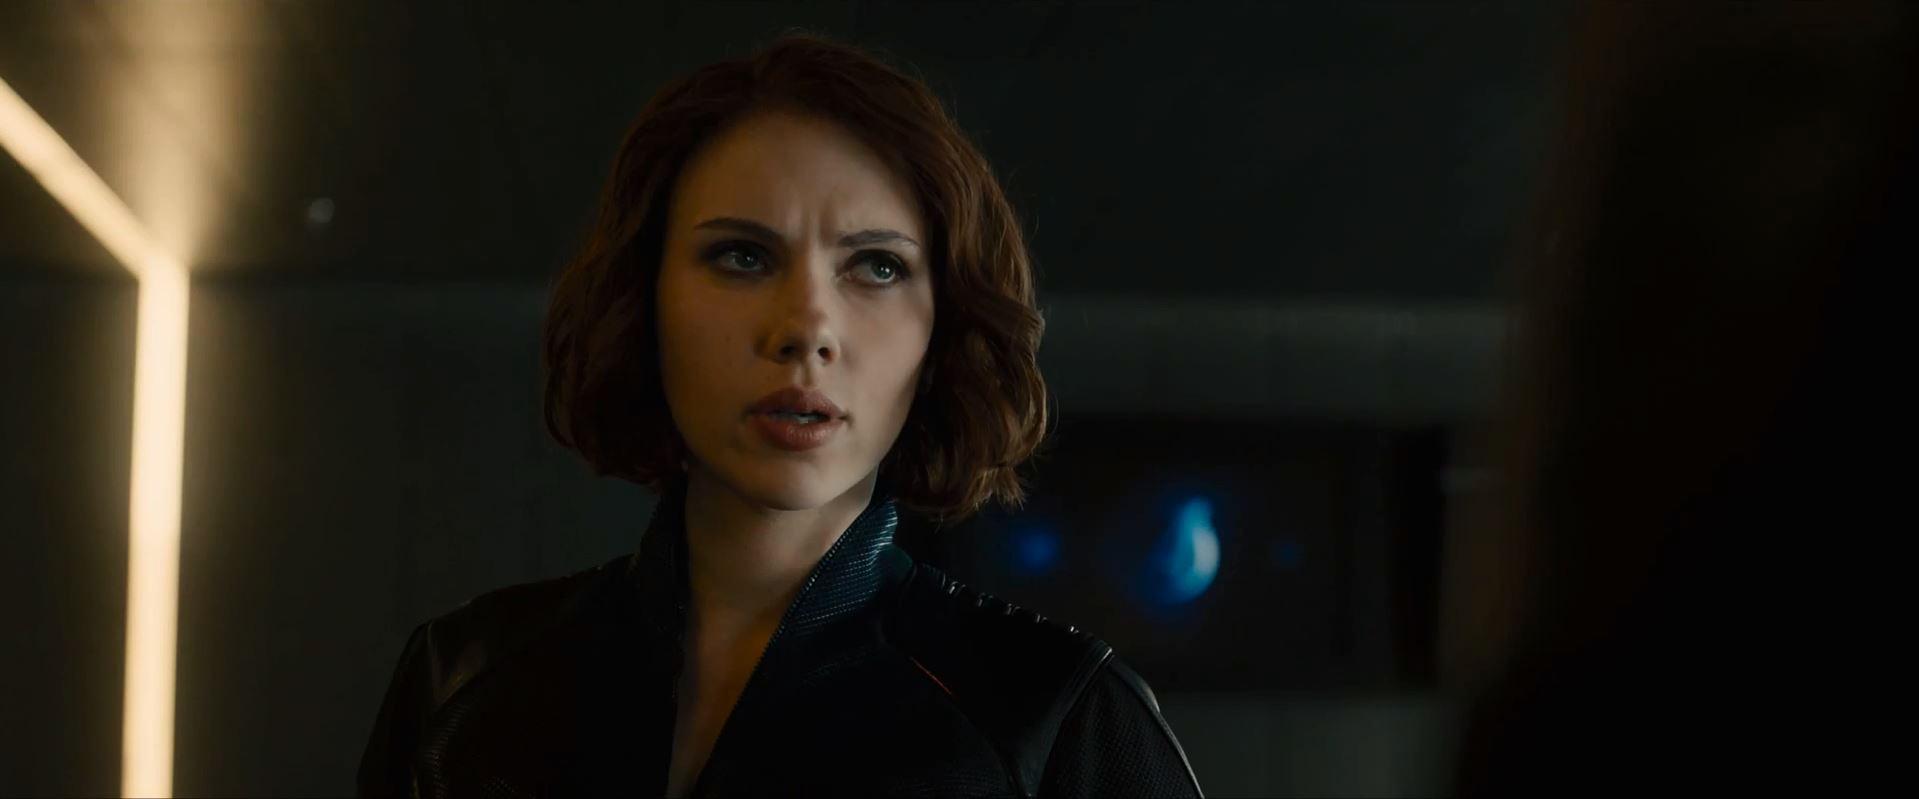 Avengers Age Of Ultron Trailer Released - Scarlett Johansson as Natasha Romanoff Black Widow